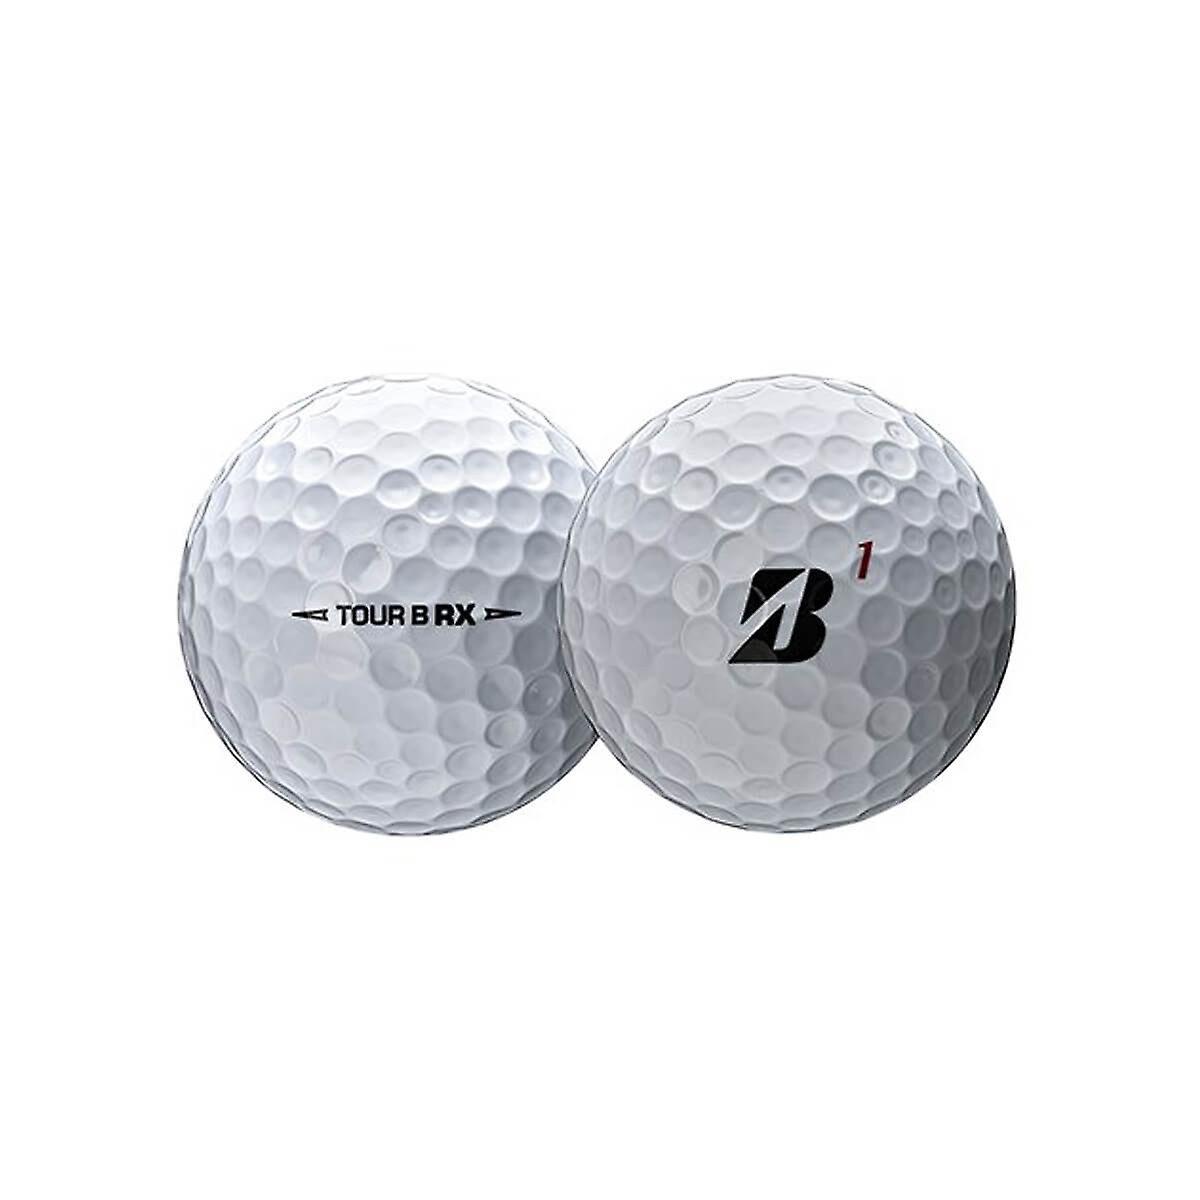 Bridgestone Unisex 2020 Bridgestone 2020 Tour B RX Golf Balls Blanc 1 Dozen